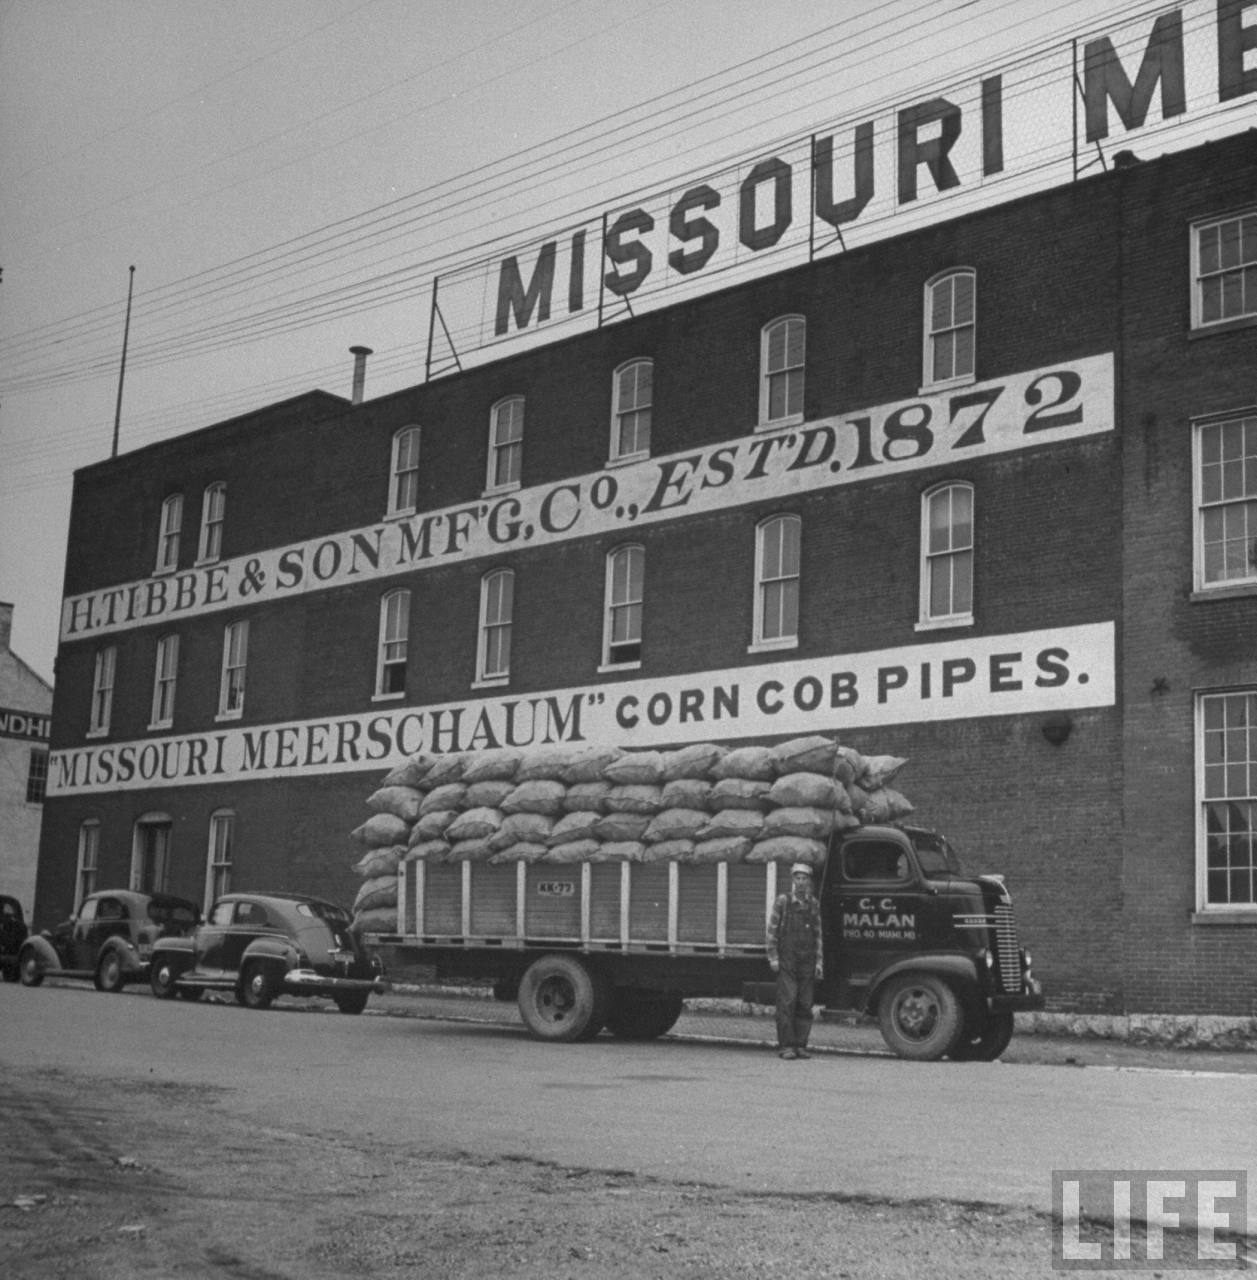 Old Photos: Missouri Meerschaums